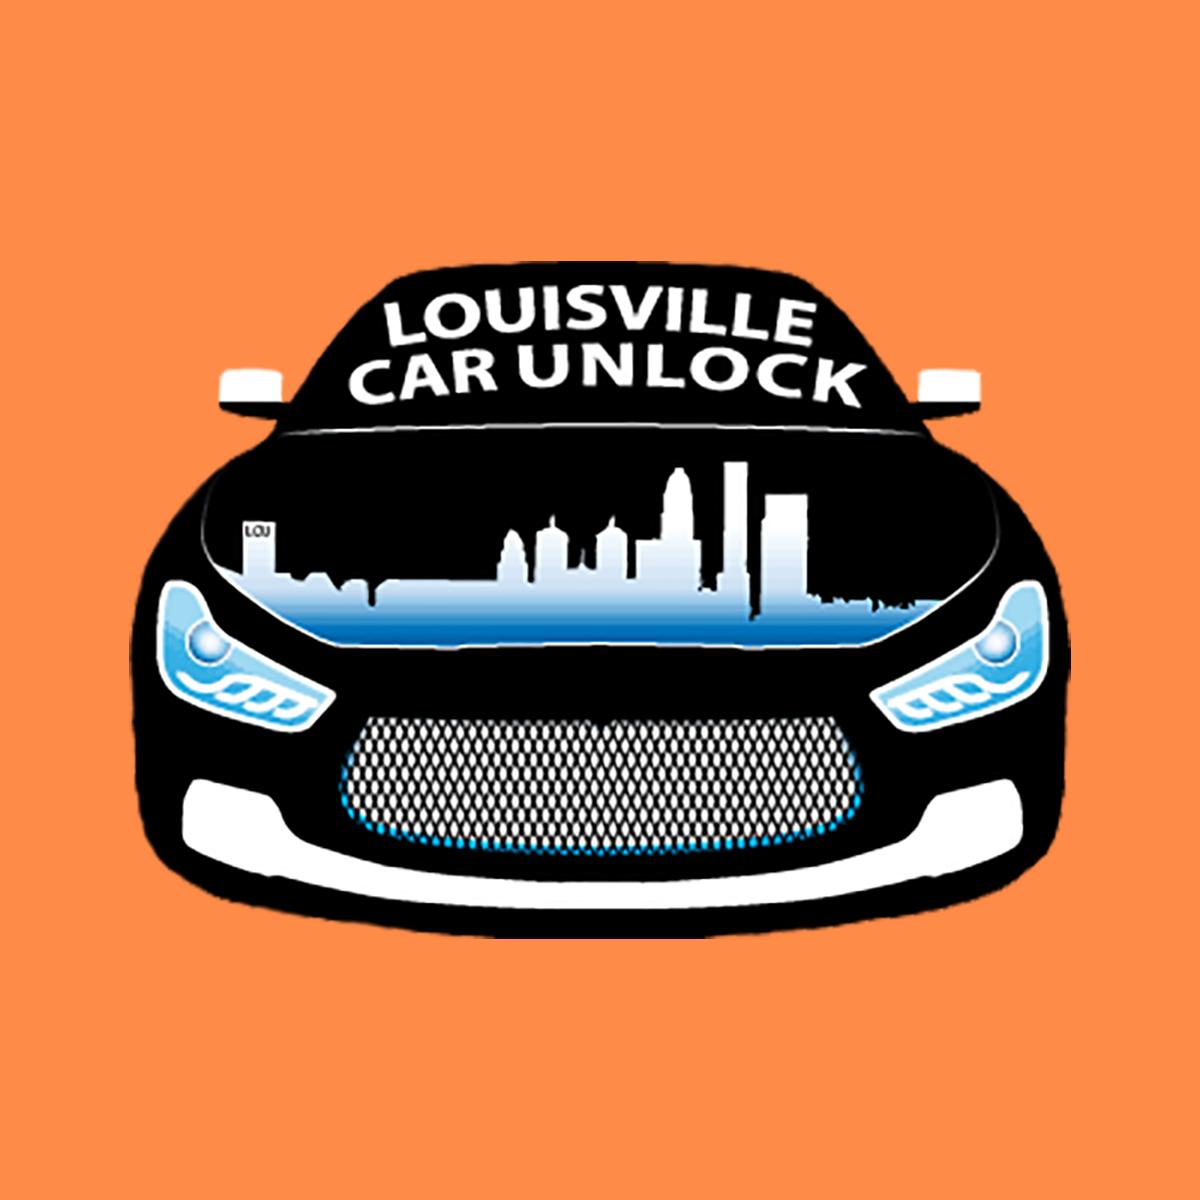 Louisville Car Unlock - $25 Daytime Flat Rate Car Unlock